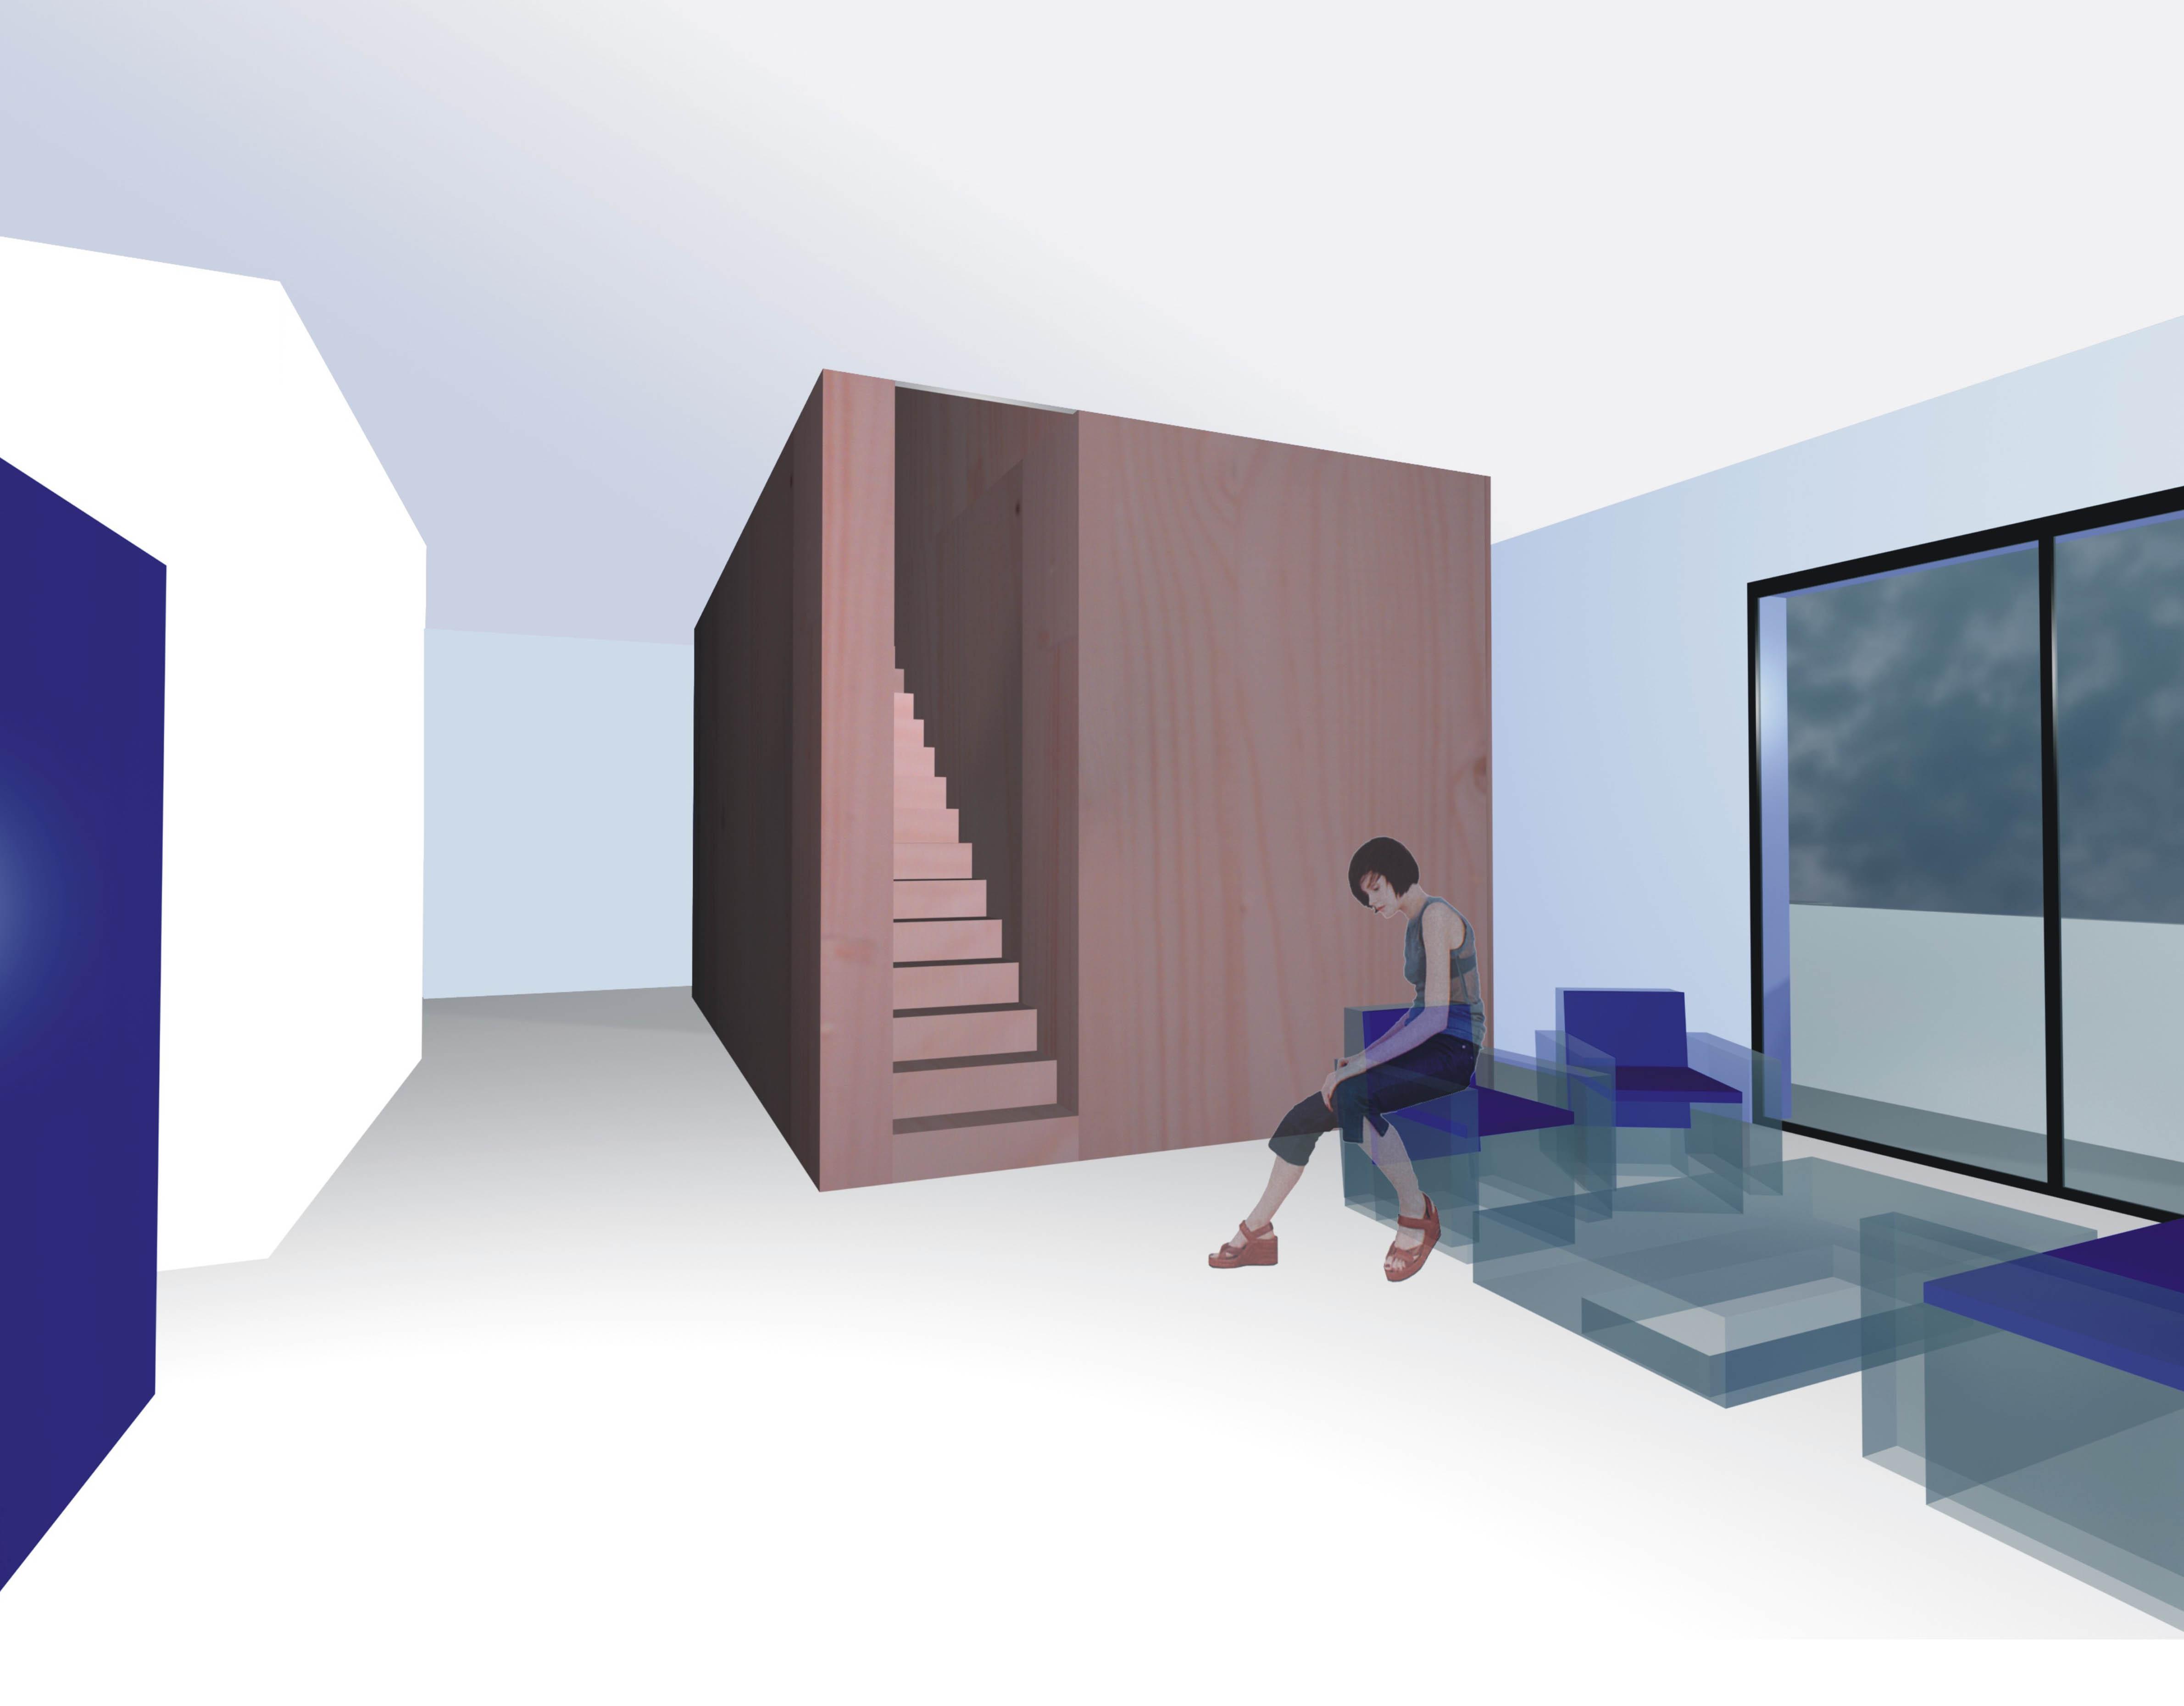 Reforma interior de vivienda studio3 arquitectura for Vivienda interior